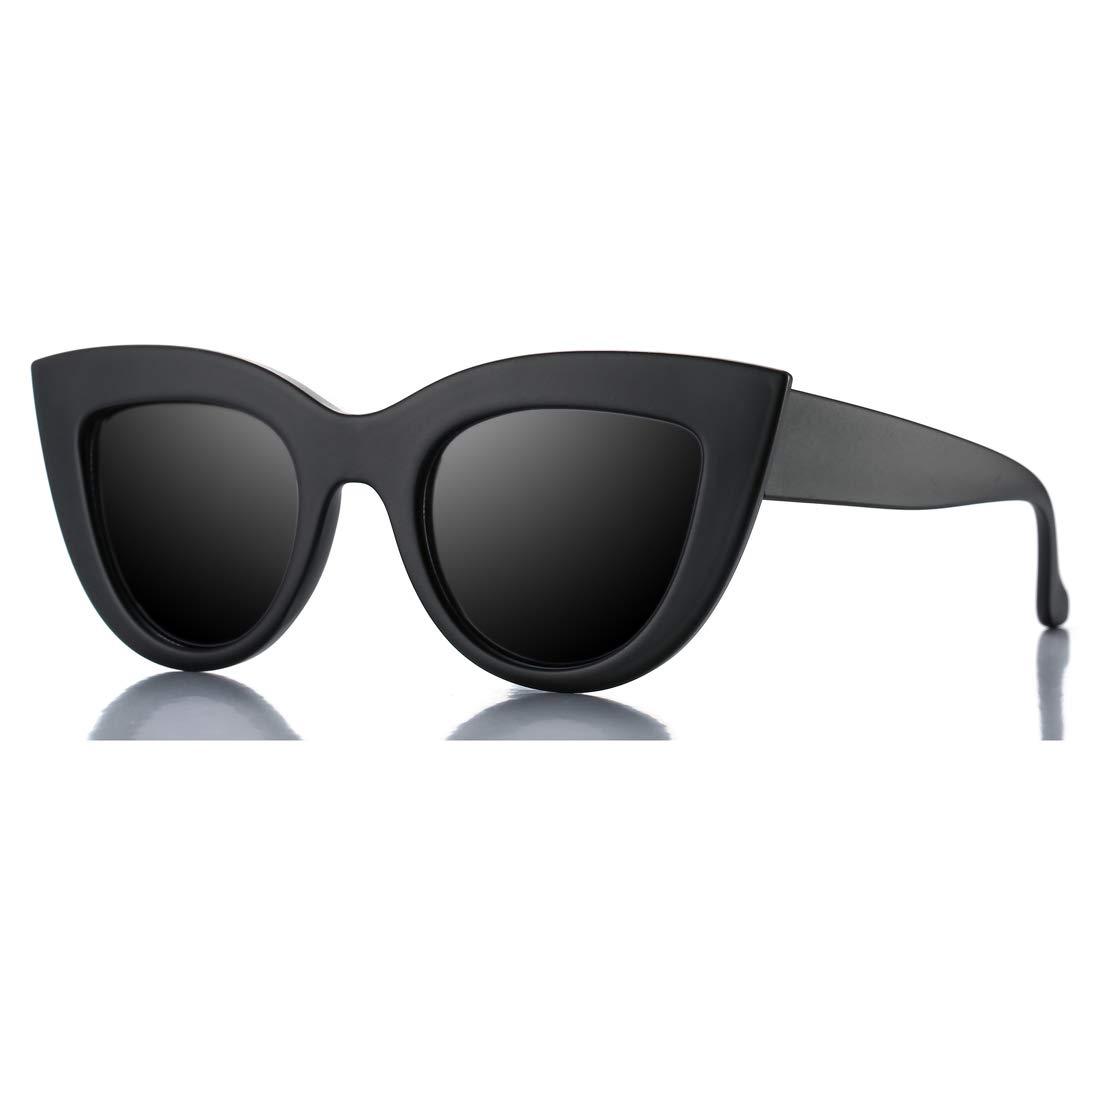 dc265eb69a4 Amazon.com  Retro Cateye Sunglasses for Women Fashion Mirror UV400  Protection Cat Eye Sun Glasses (Matte Black Frame Black Lens)  Shoes